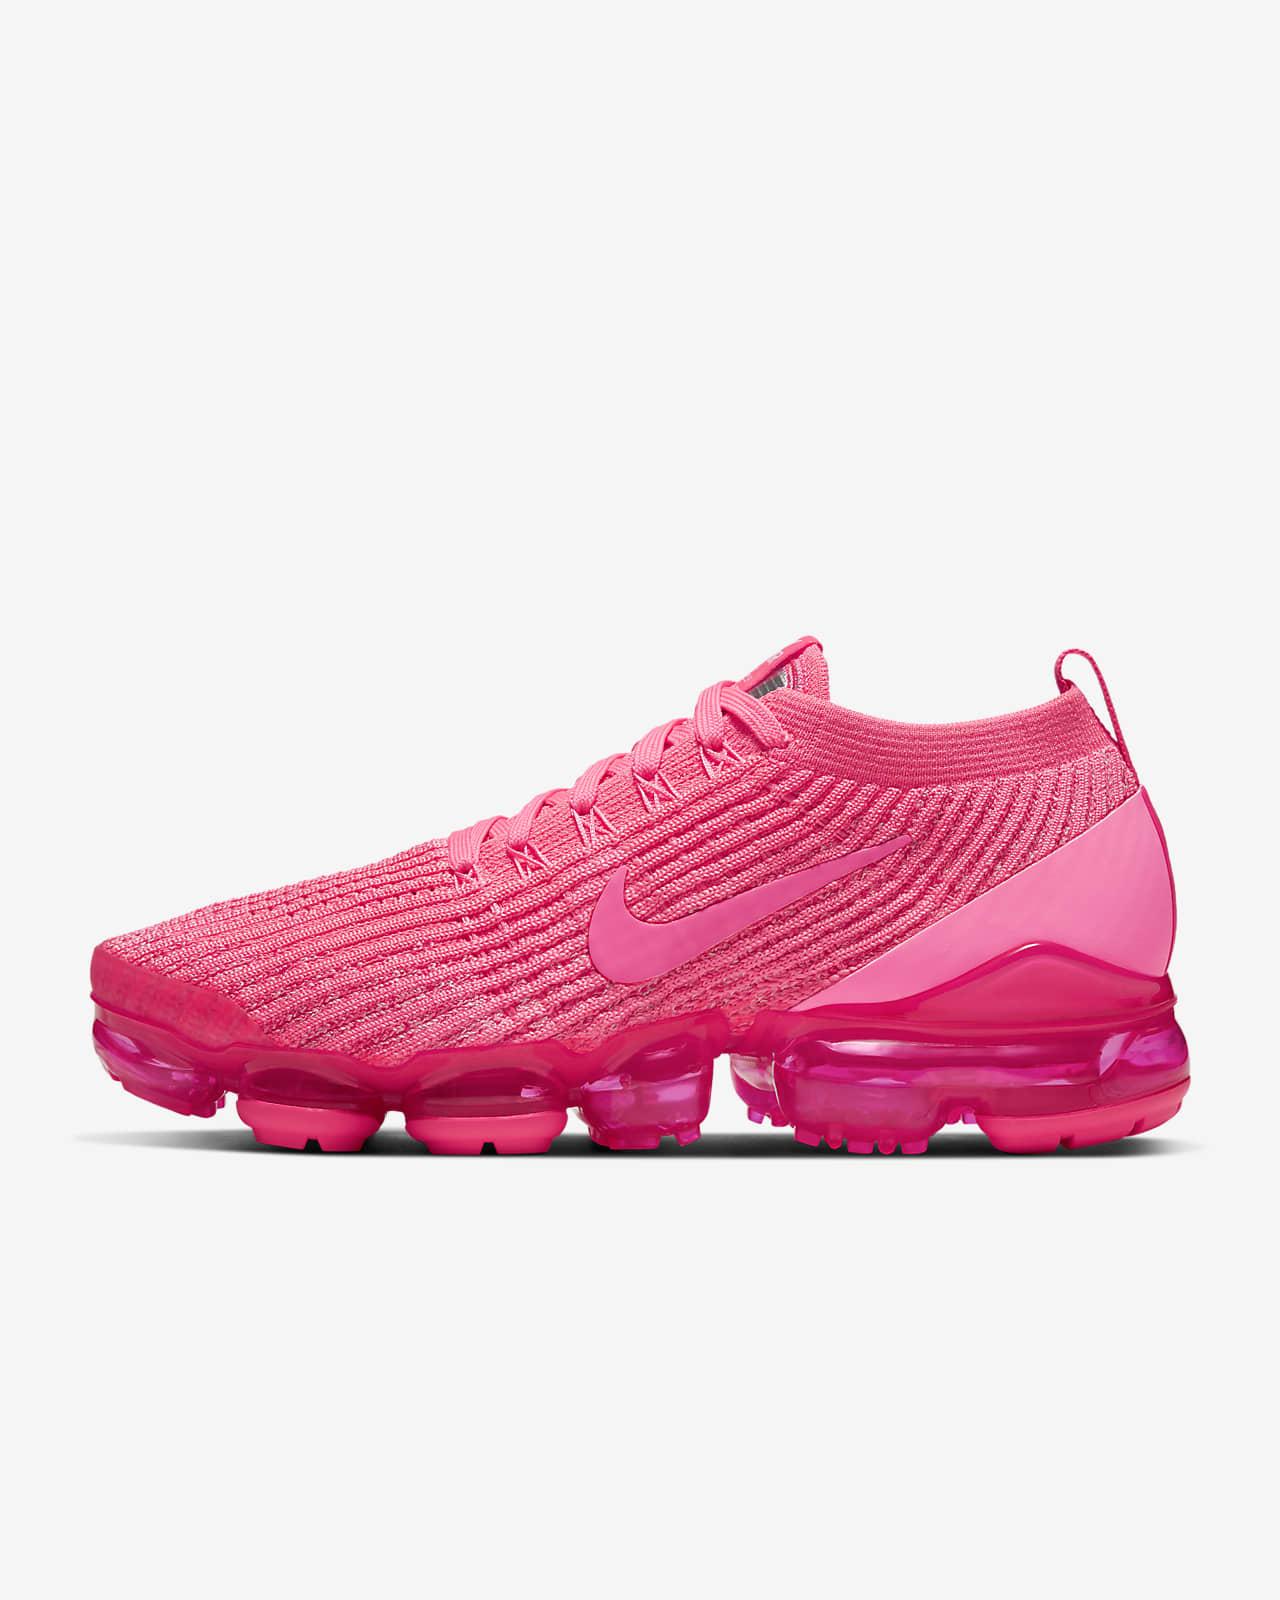 Purchase \u003e nike vapormax rose pink, Up